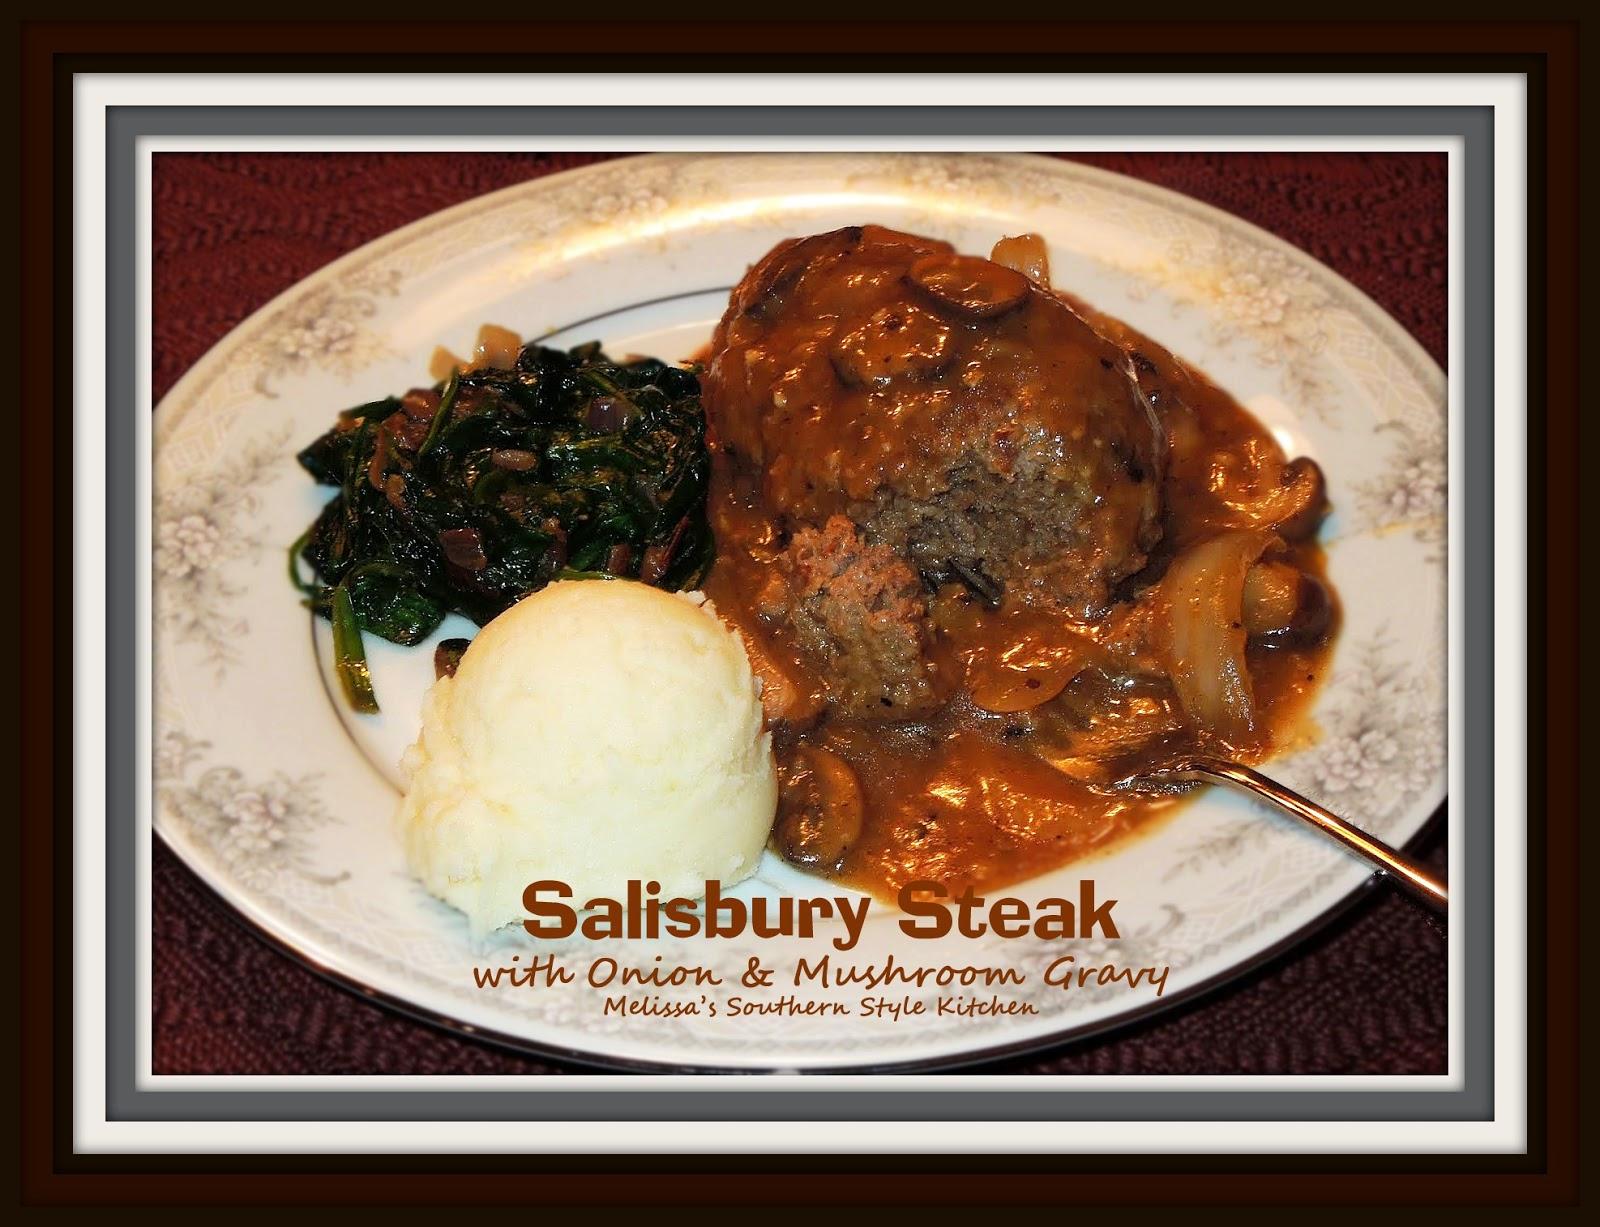 Salisbury Steak with Onion & Mushroom Gravy